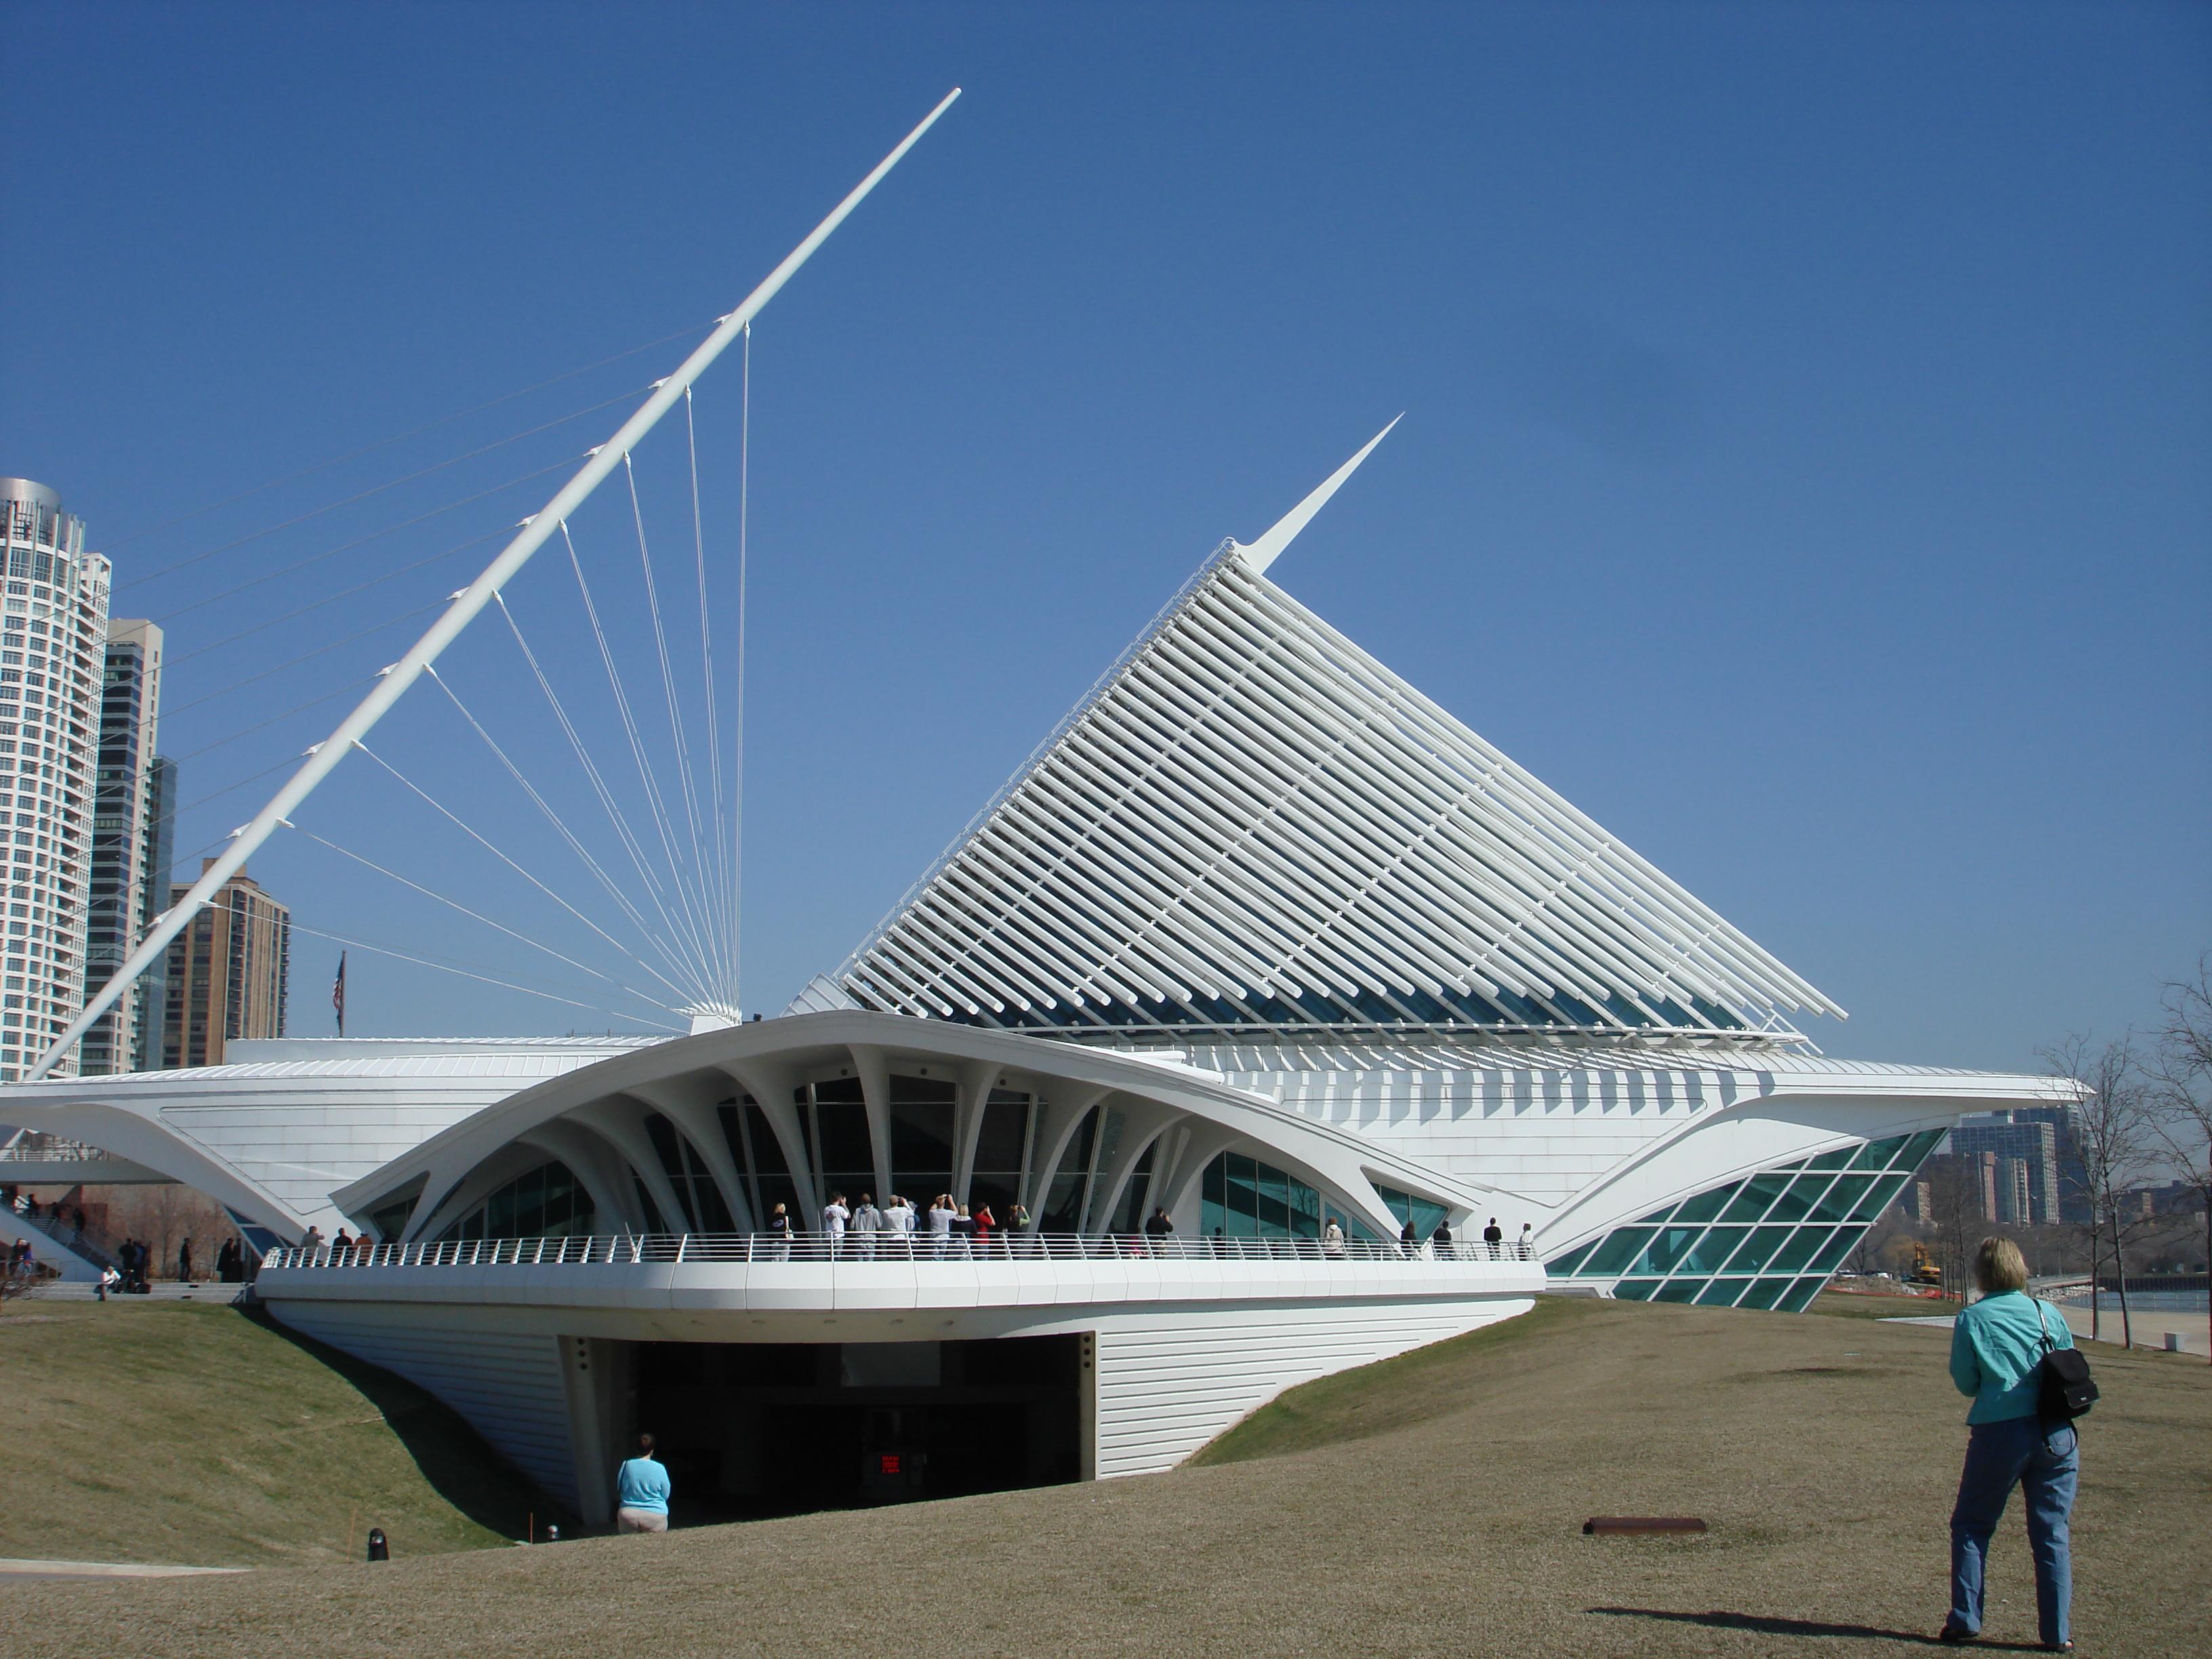 The Milwaukee Art Museum's Calatrava Addition